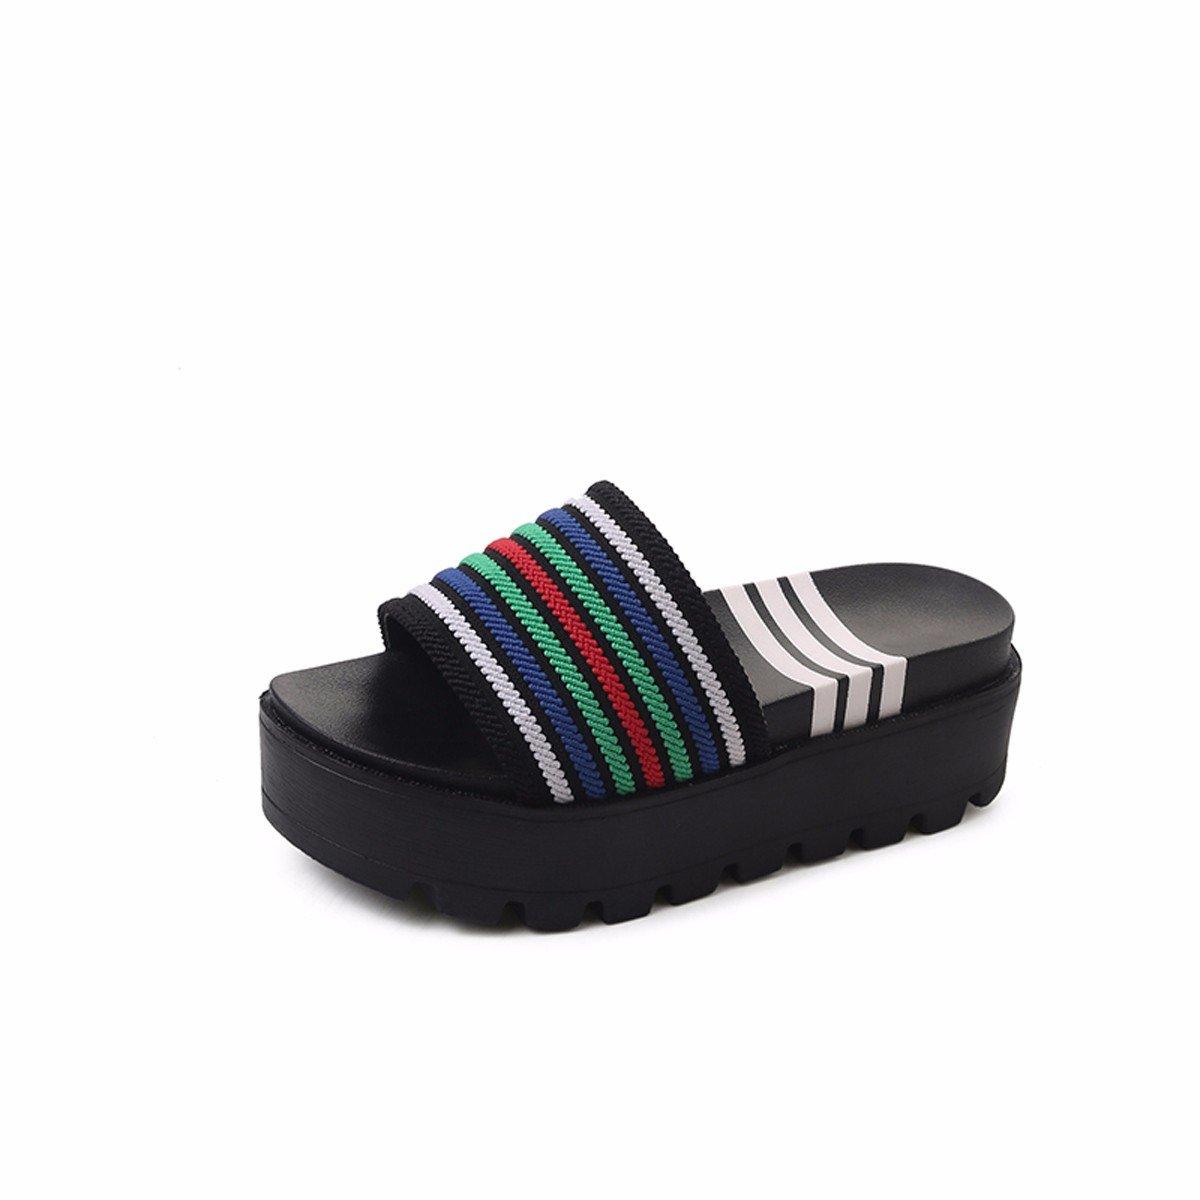 HBDLH Damen Hausschuhe Schuhe  Fashion Frauen Sommer Muffins Dick Tiefste 6 cm High Heels Wort Drag Joker Außen Wear Cool Hausschuhe Wasserdicht Plattform.